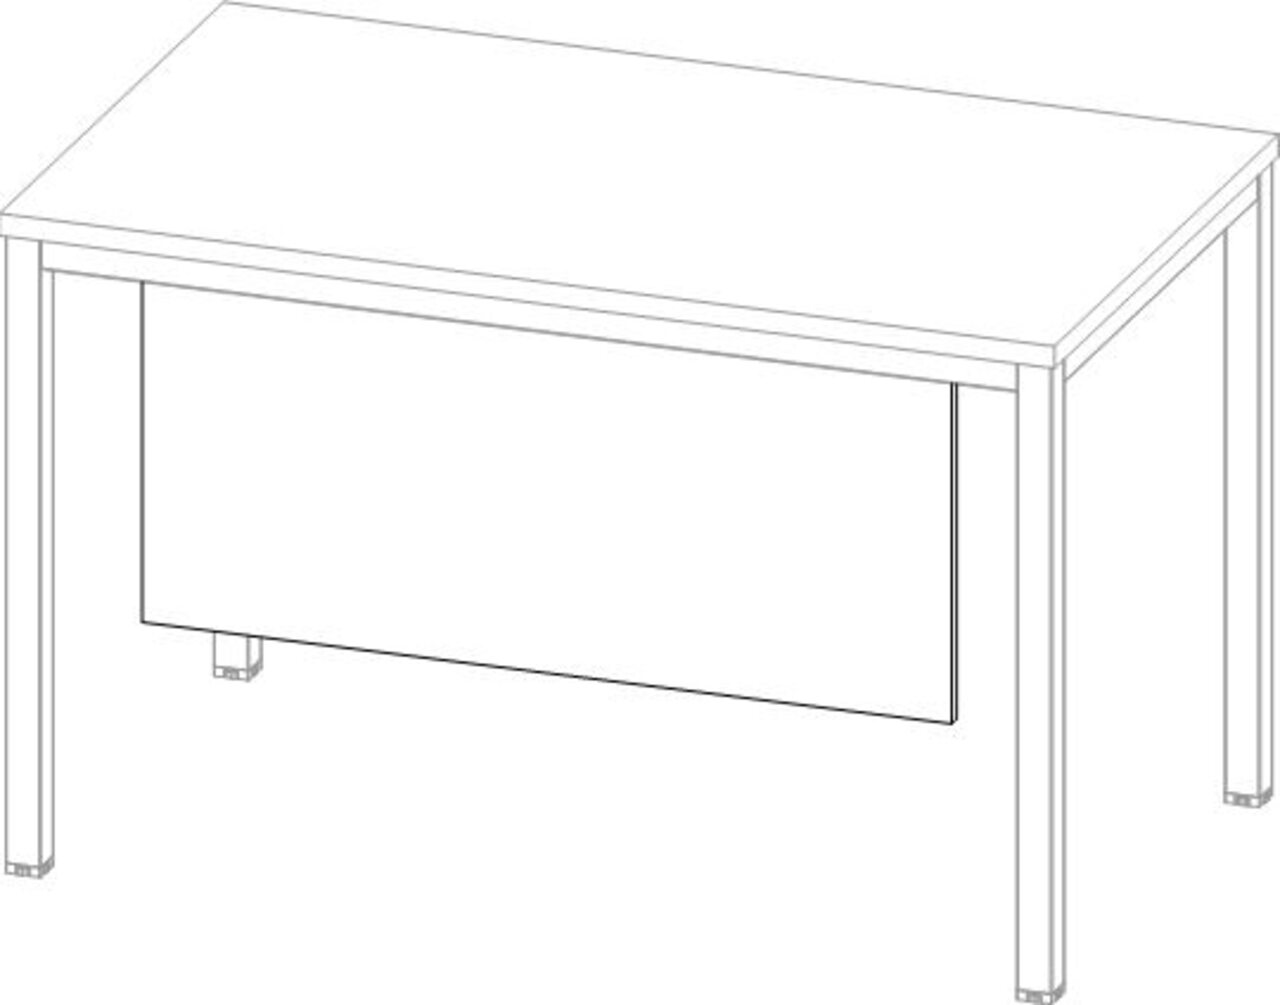 Царга к столу - фото 2